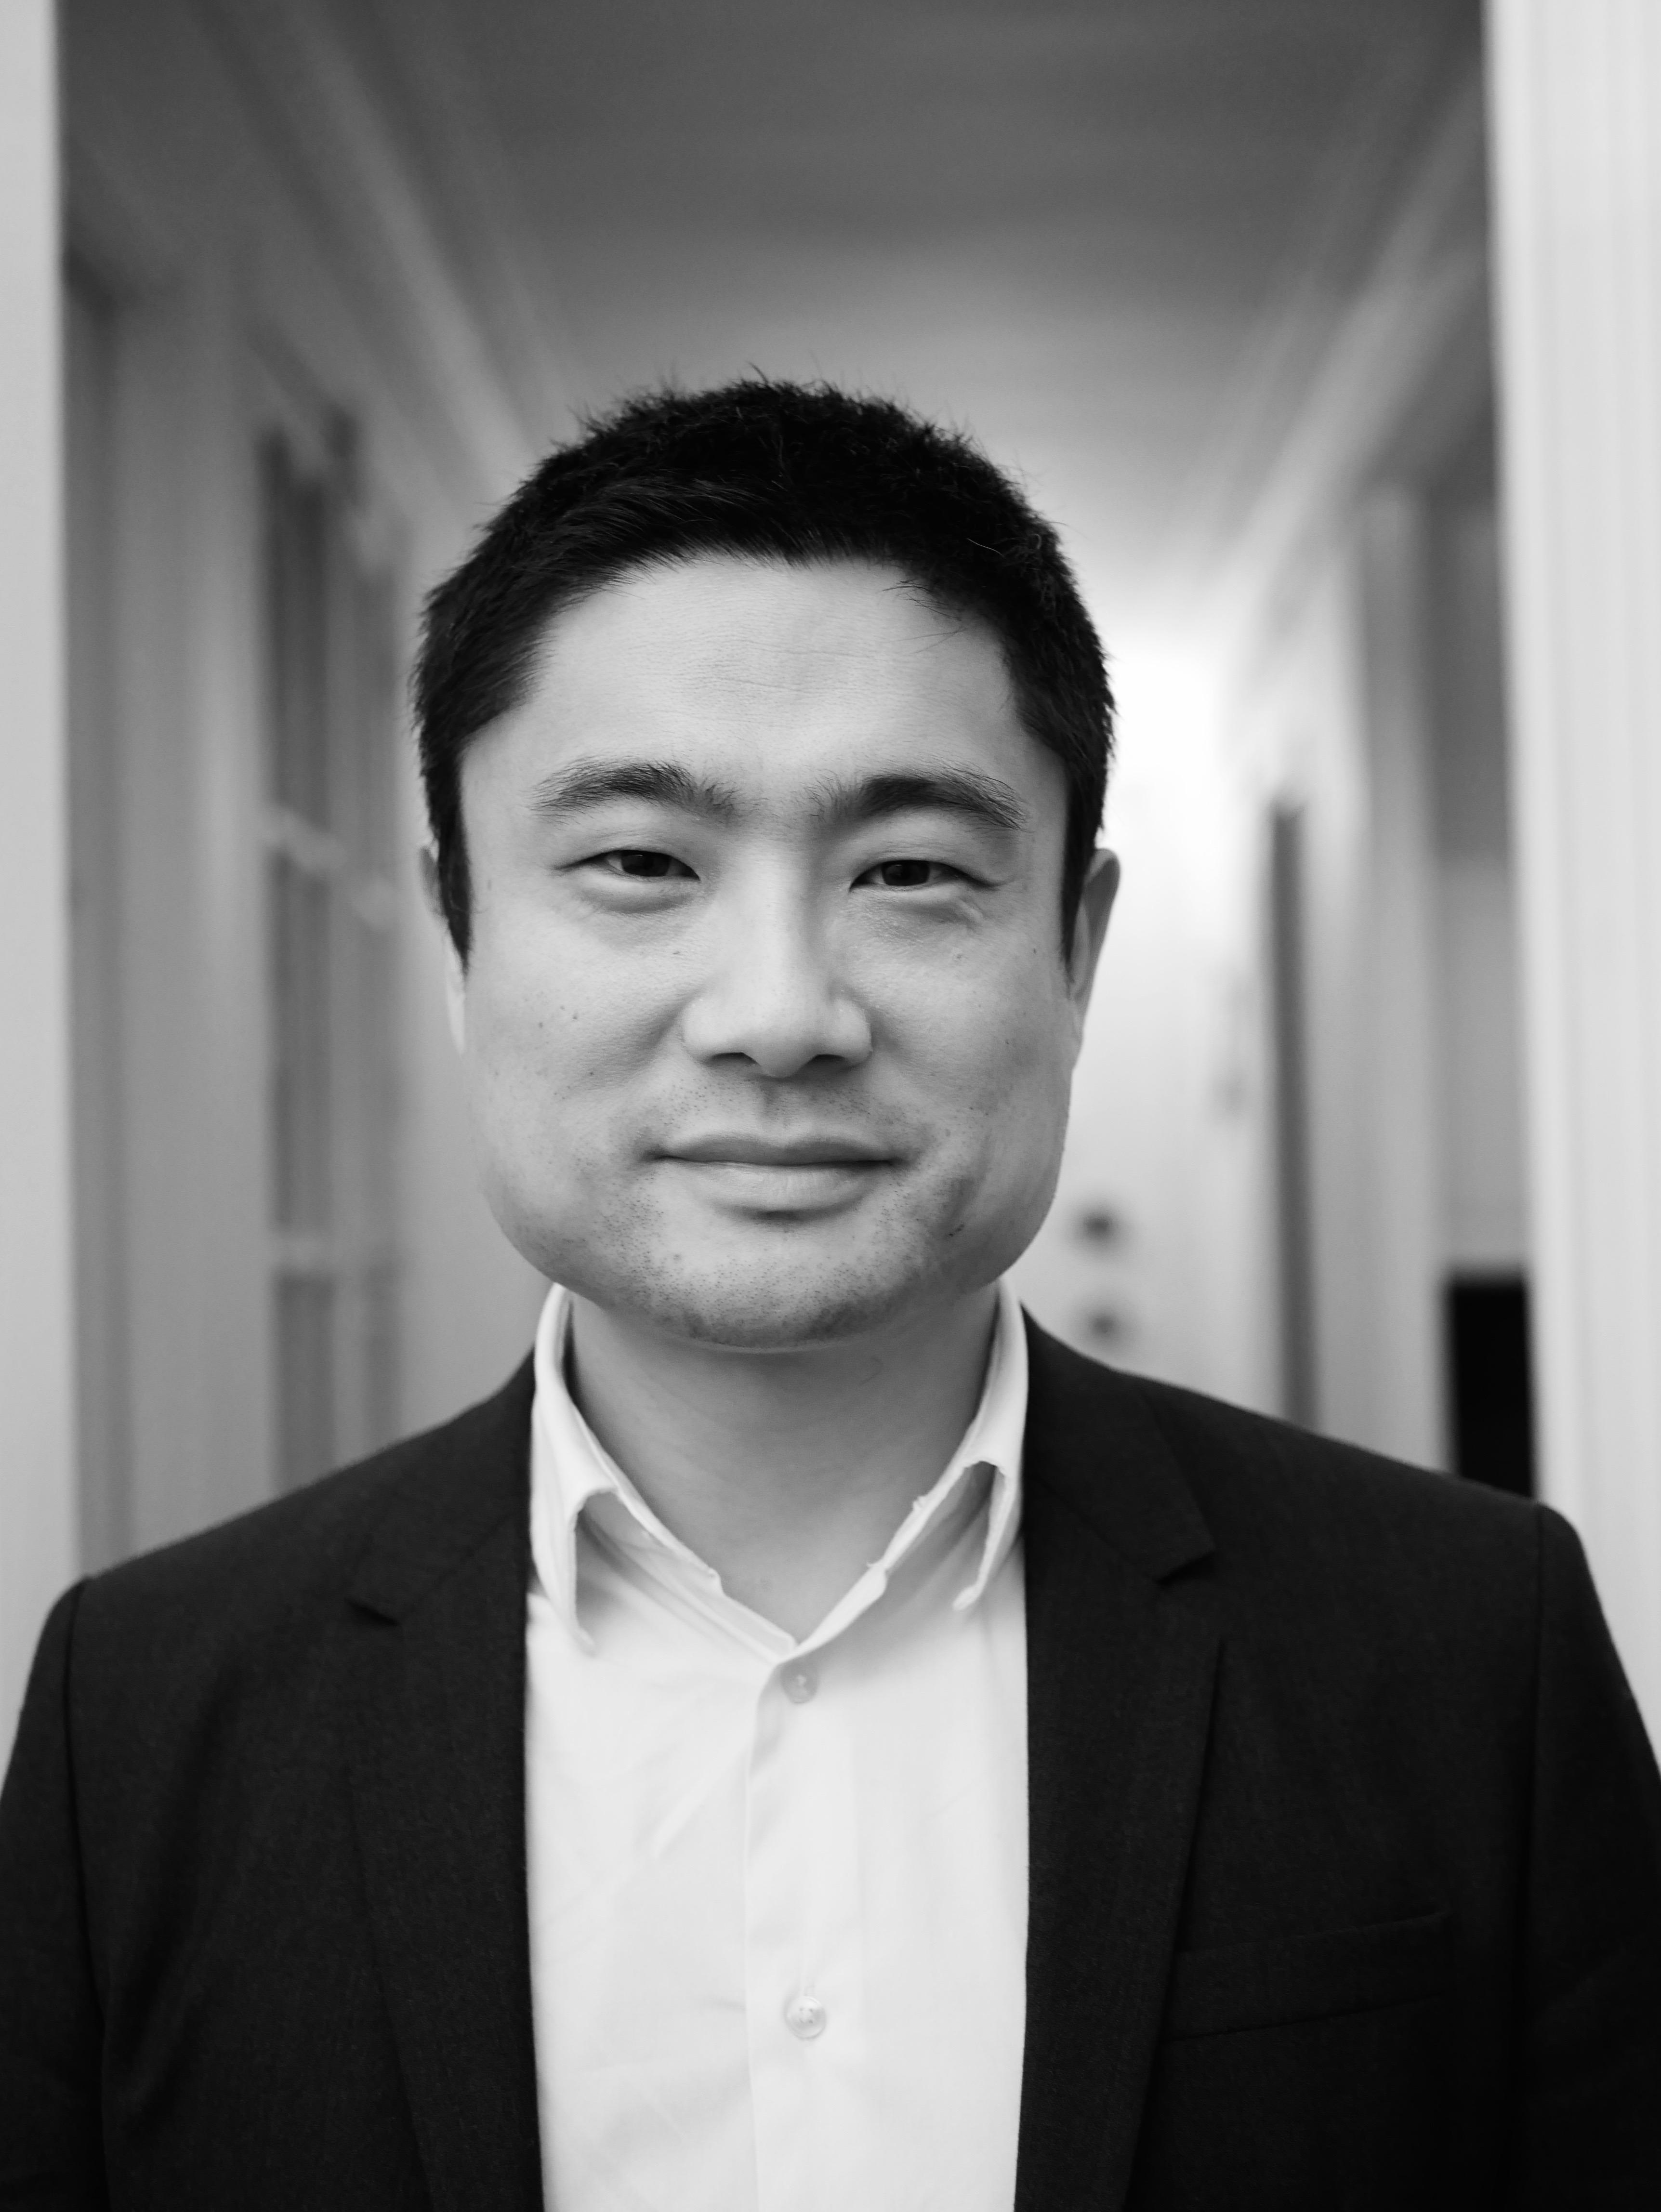 Christian Lim